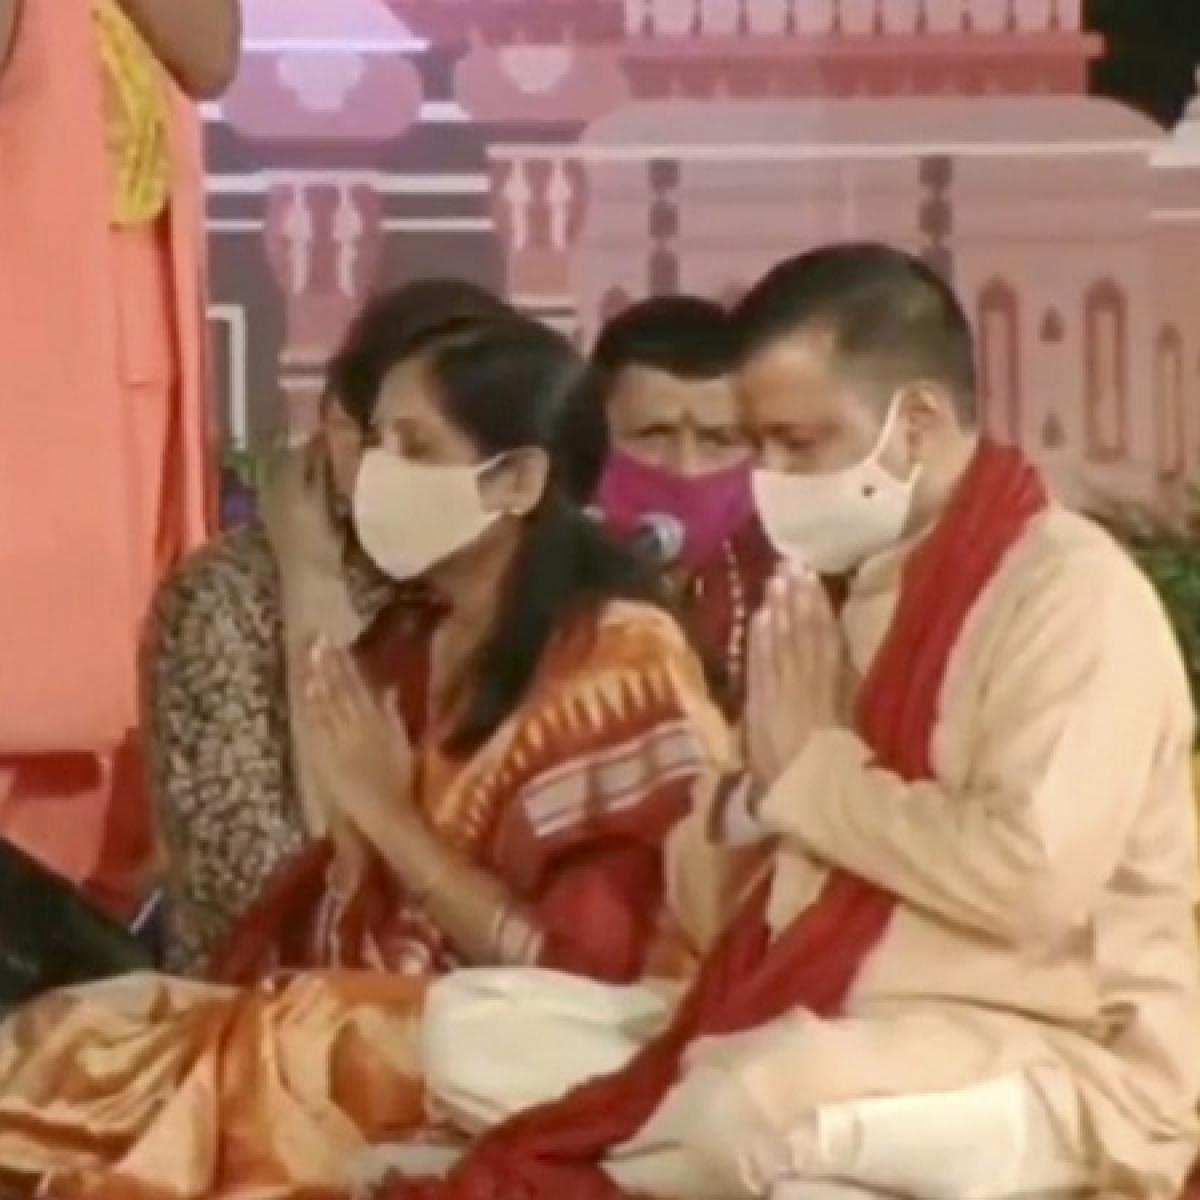 'Wasting taxpayers money': Twitter after Arvind Kejriwal, wife perform Diwali puja at Delhi's Akshardham temple